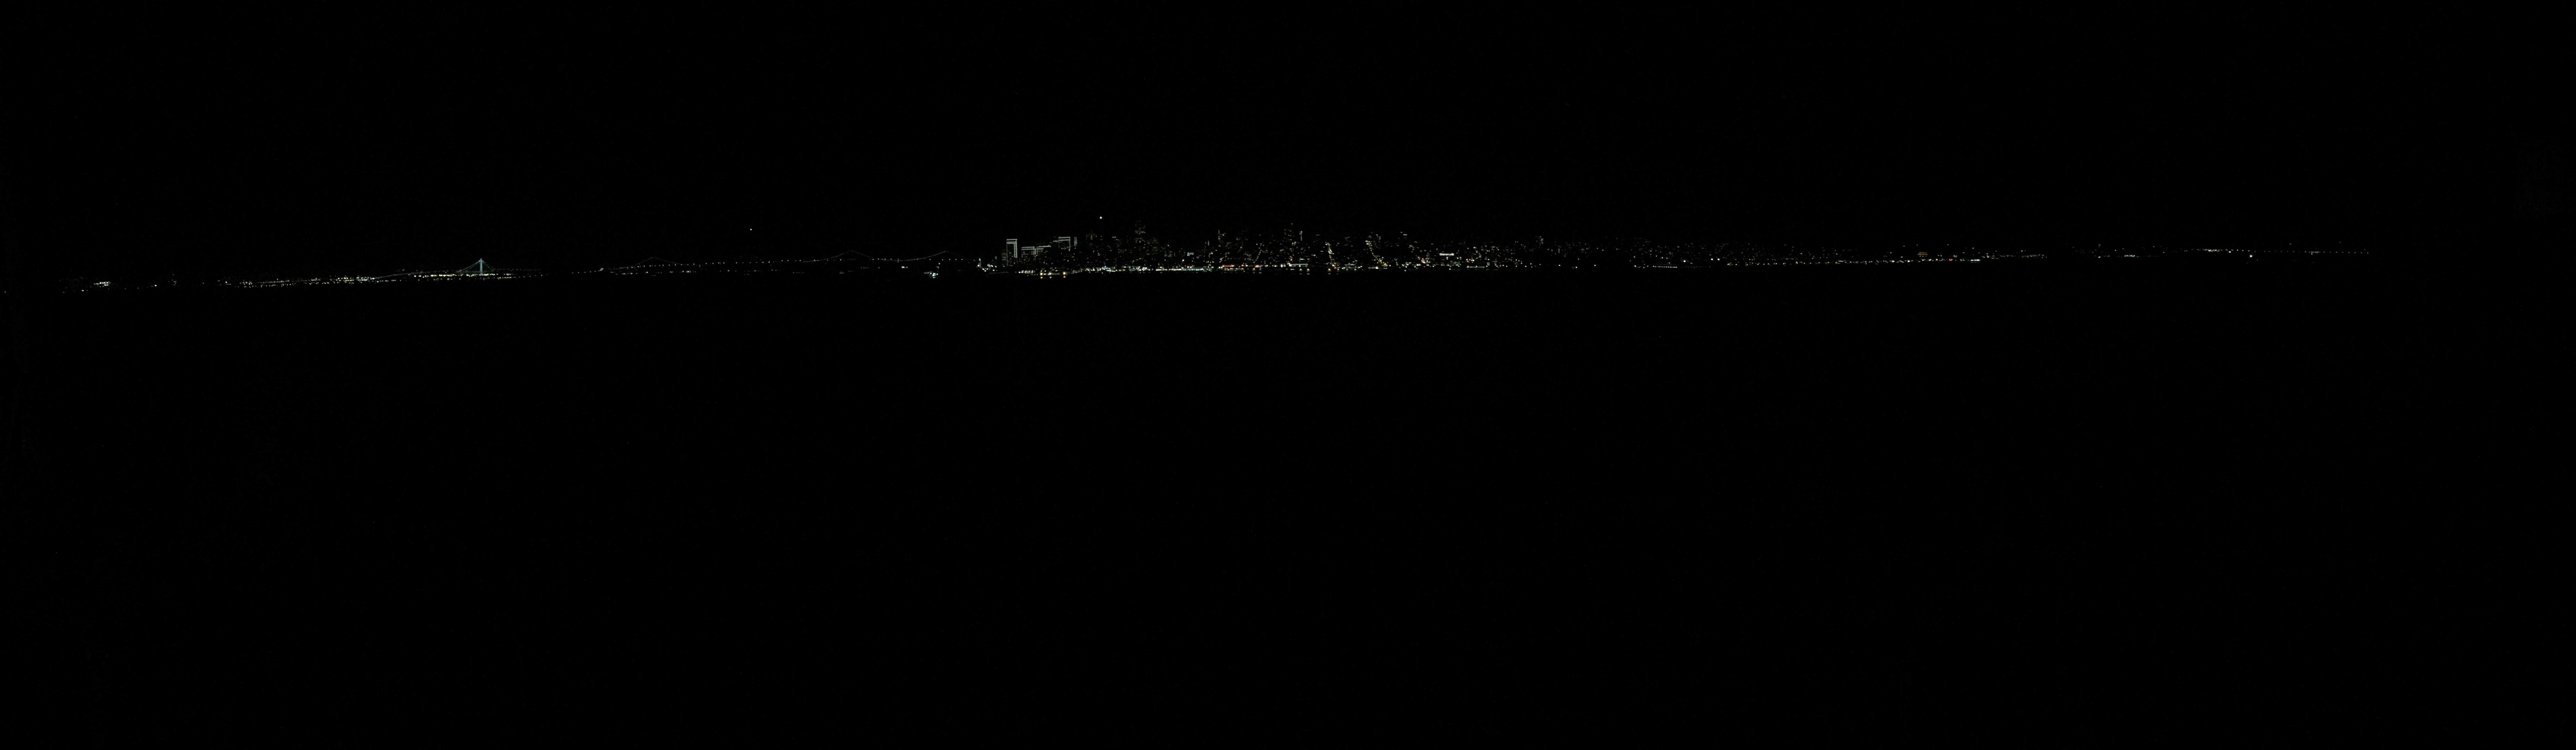 25 San Fran Night